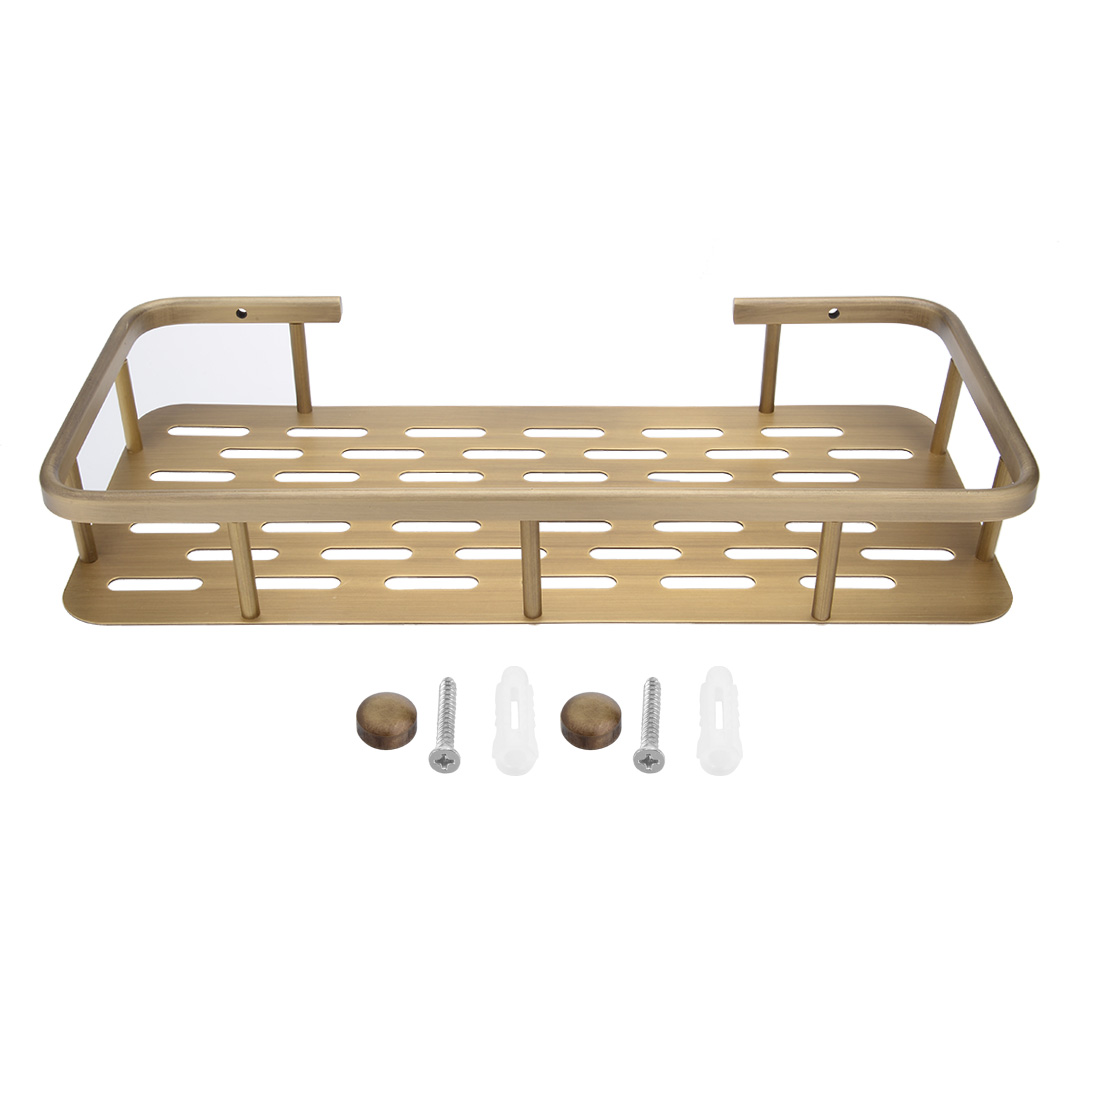 12-inch Brass Brushed Finish Bathroom Shower Caddy Basket Bronze Tone